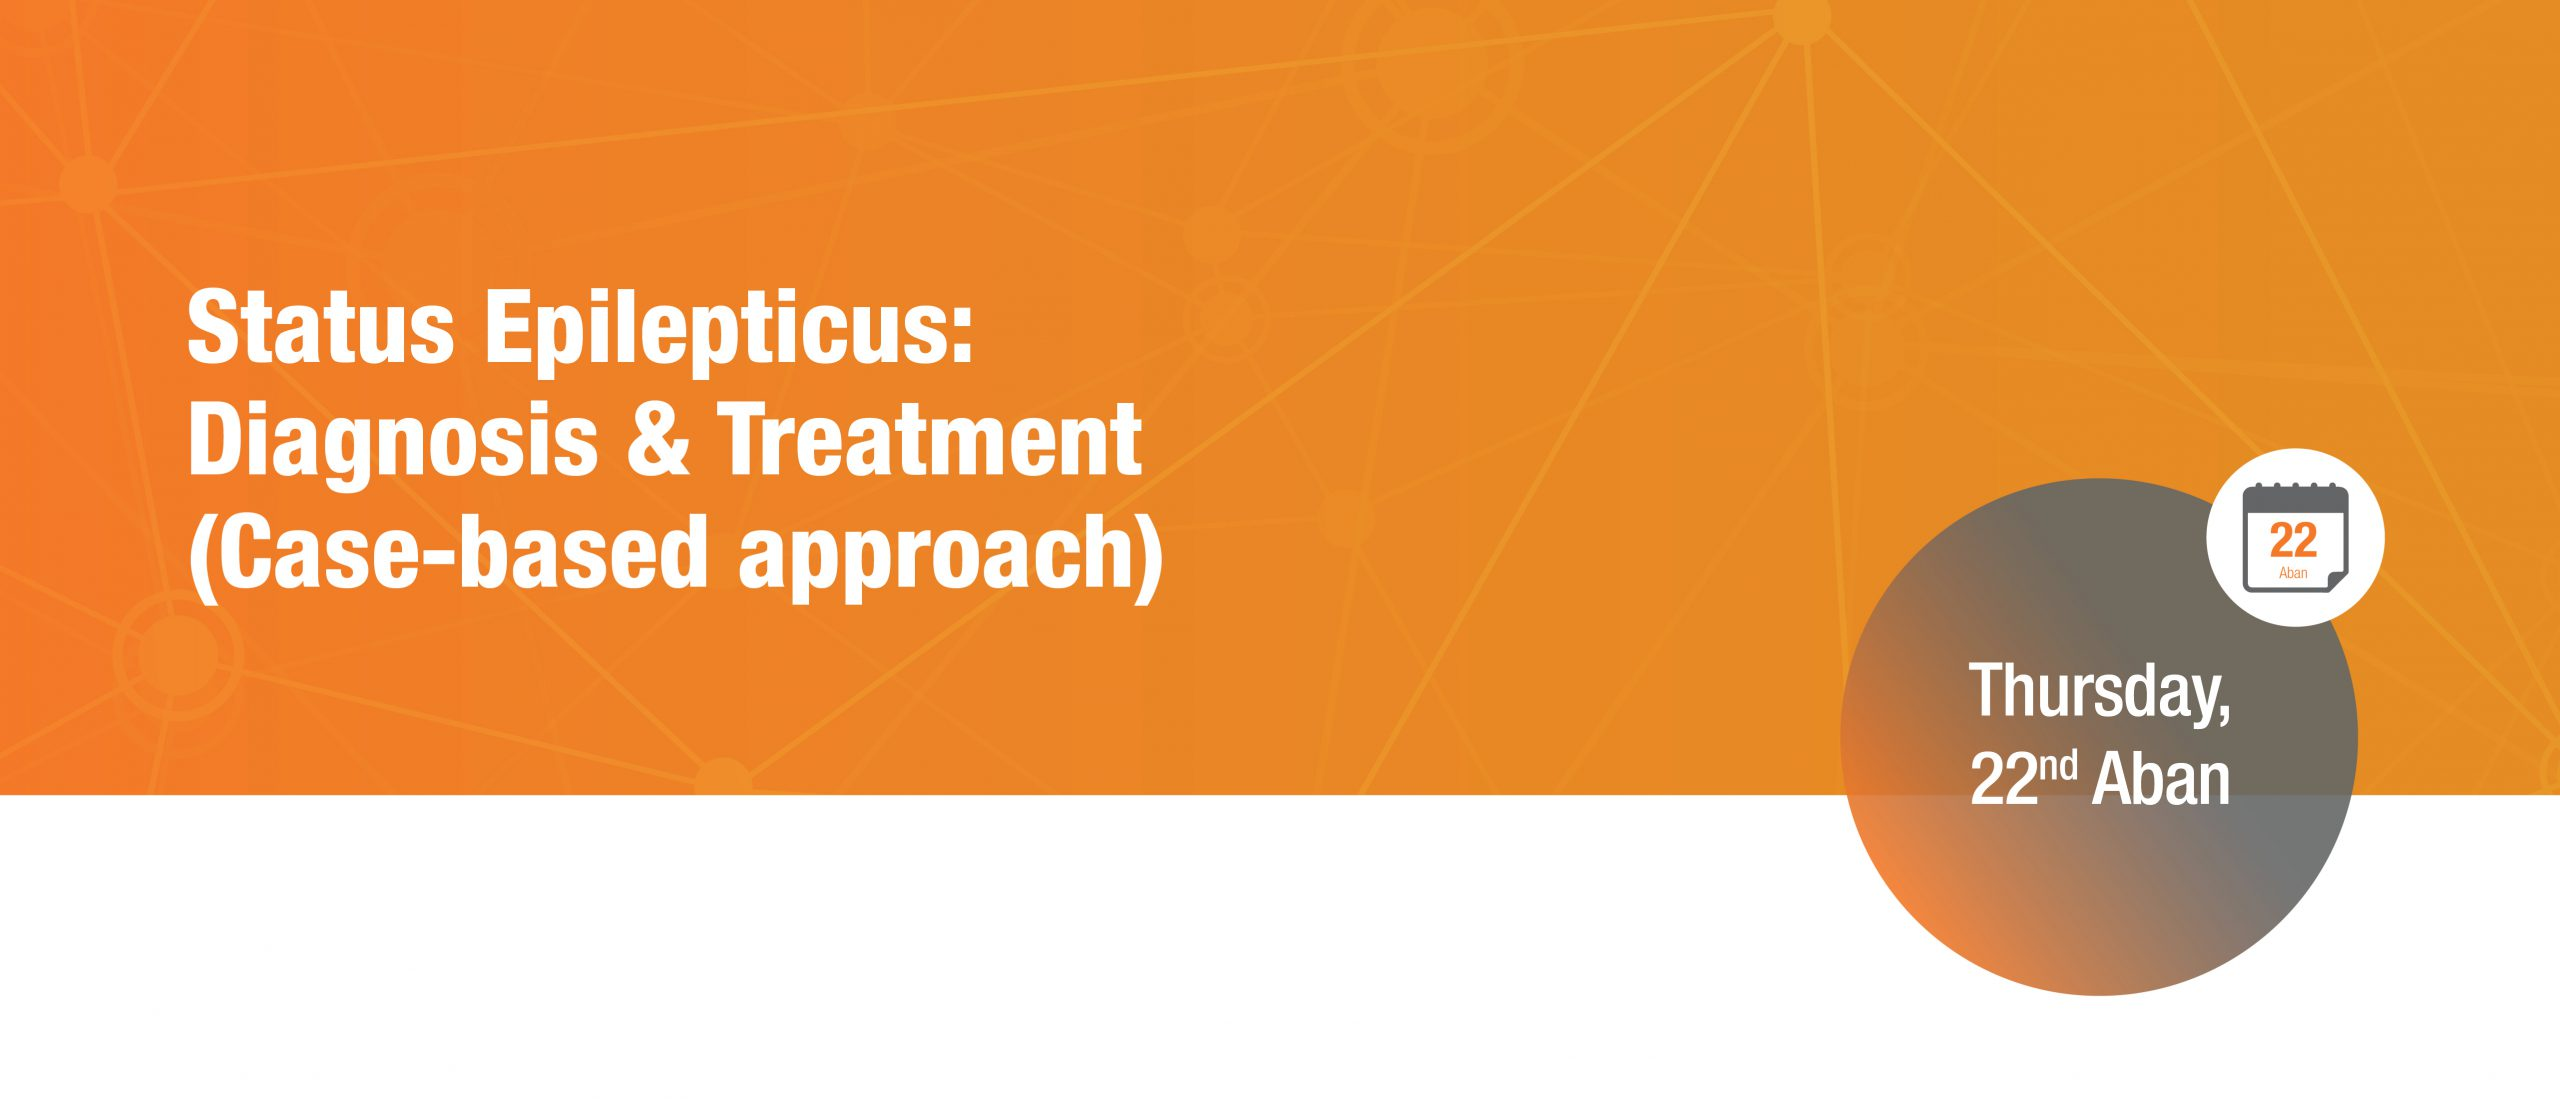 Status Epilepticus Diagnosis and Treatment